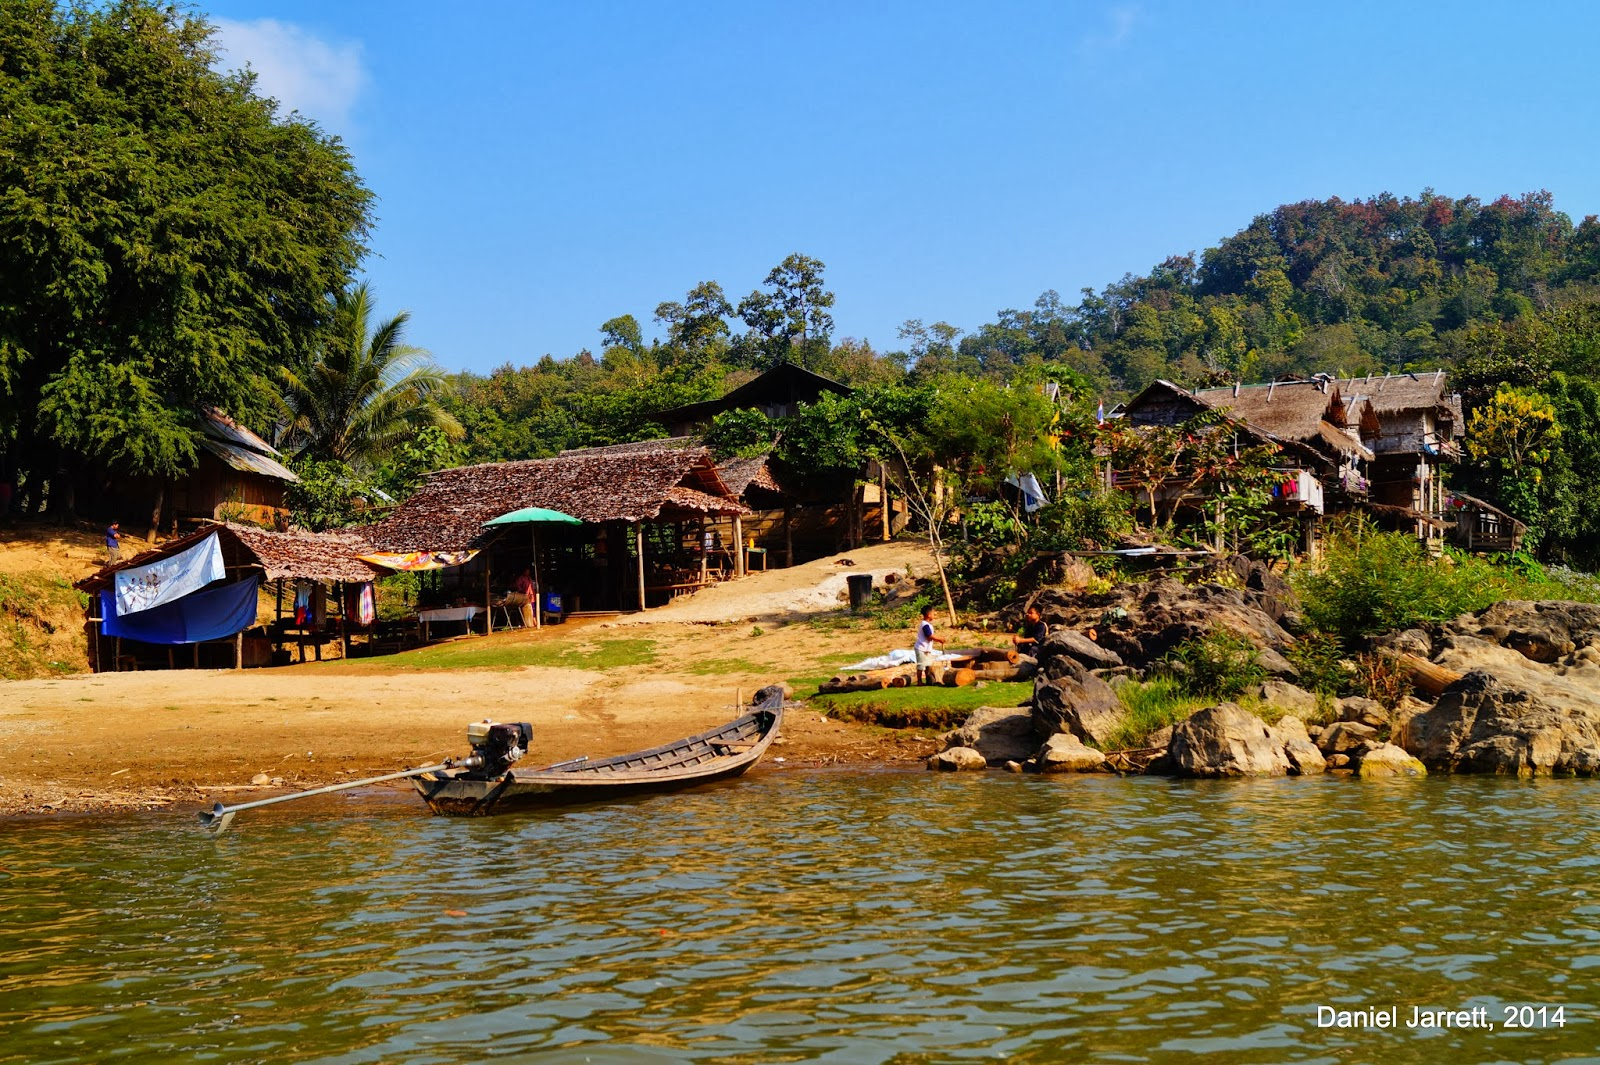 Huay Pu Keng (Baan Nam Piang Din) Boat Dock